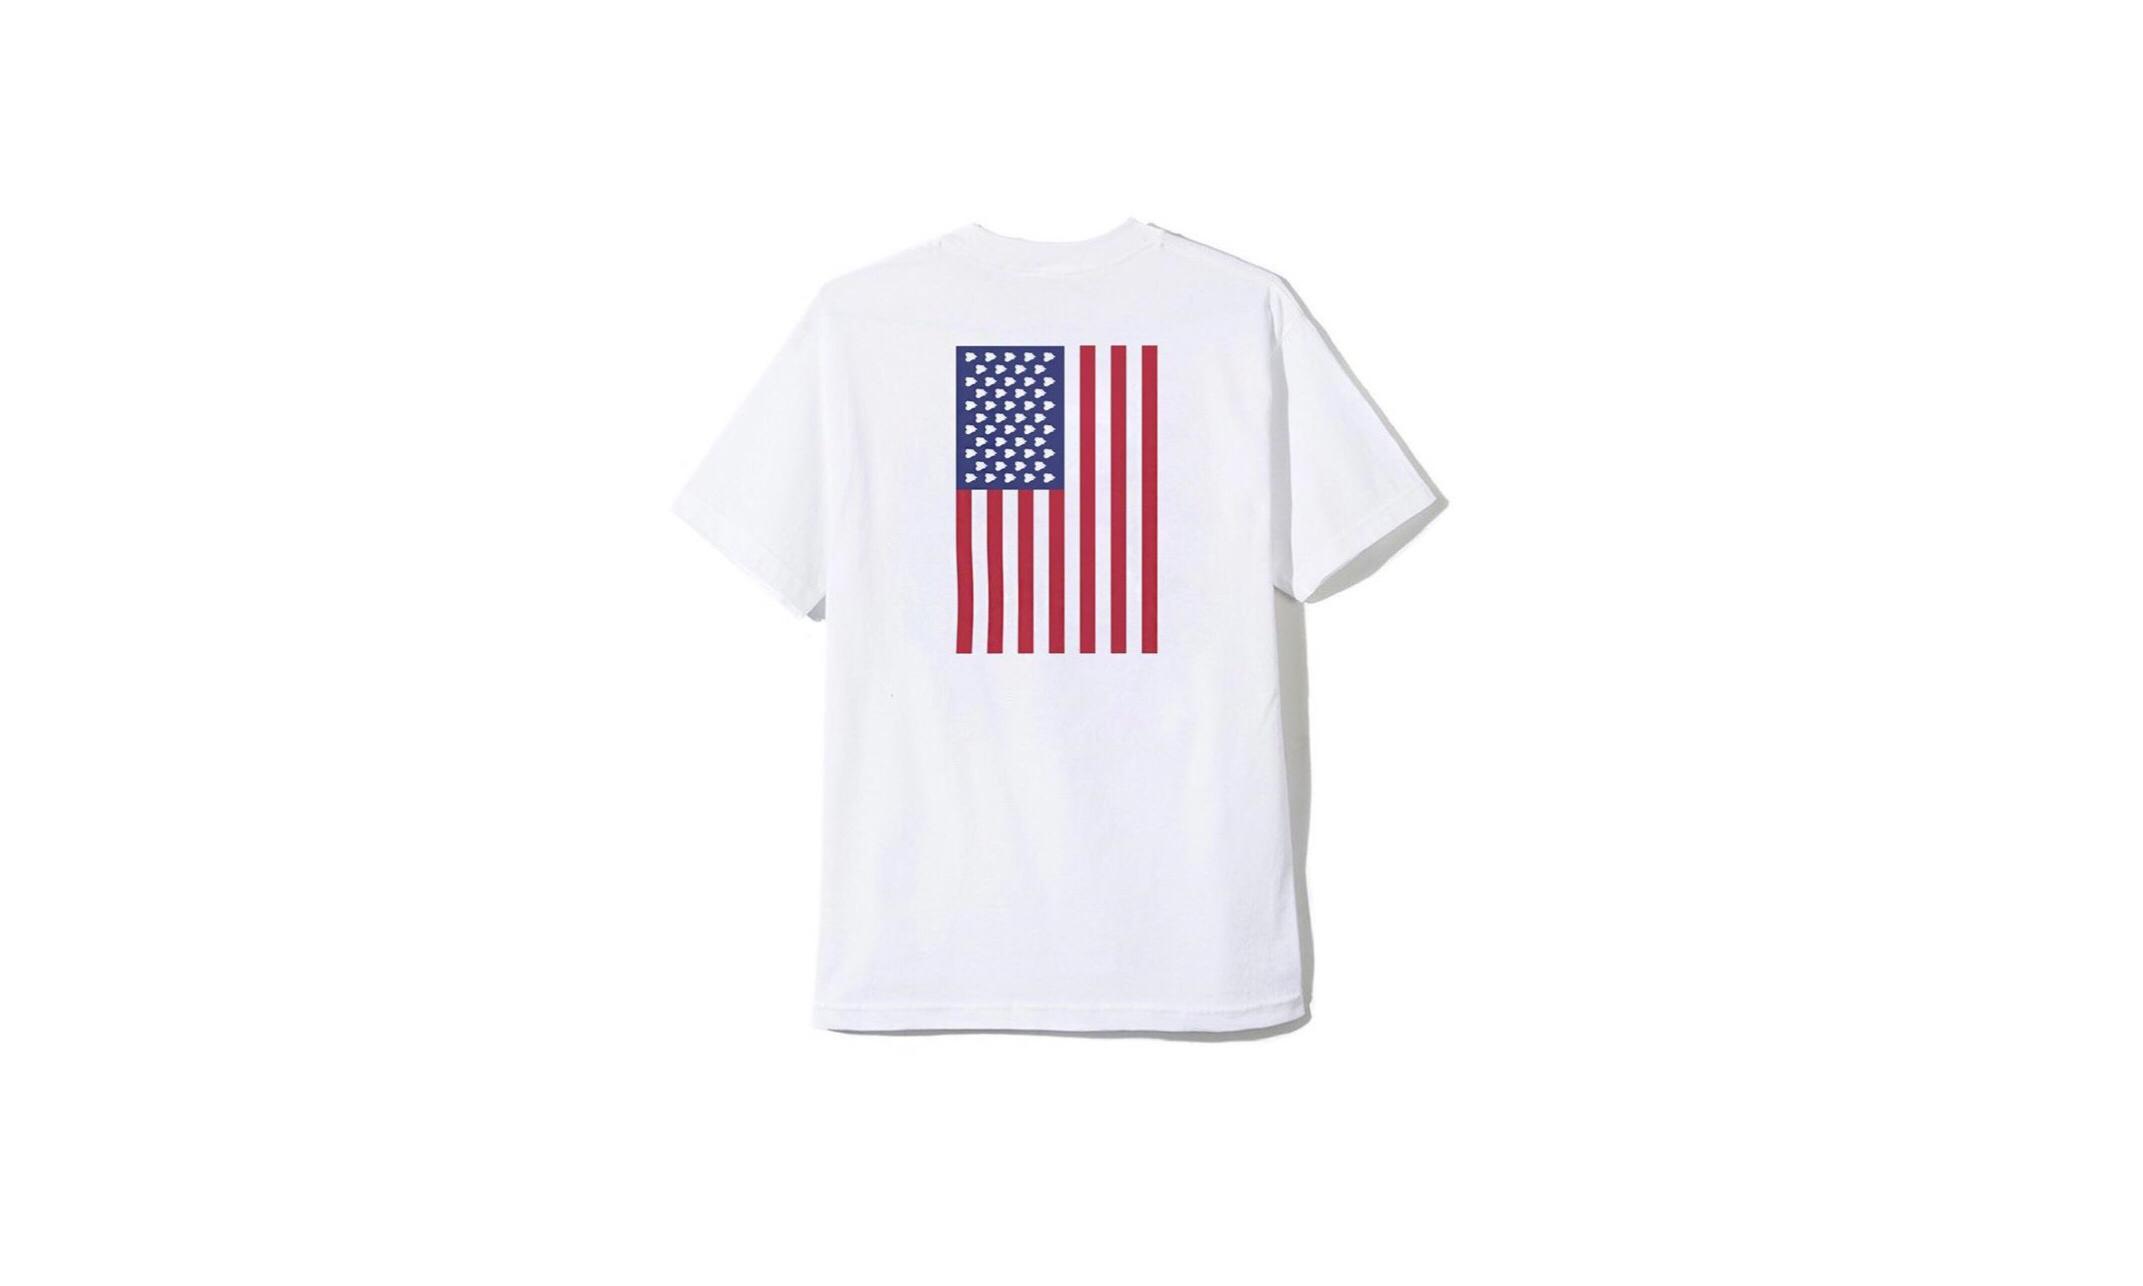 Emotionally Unavailable 释出全新美国国旗系列